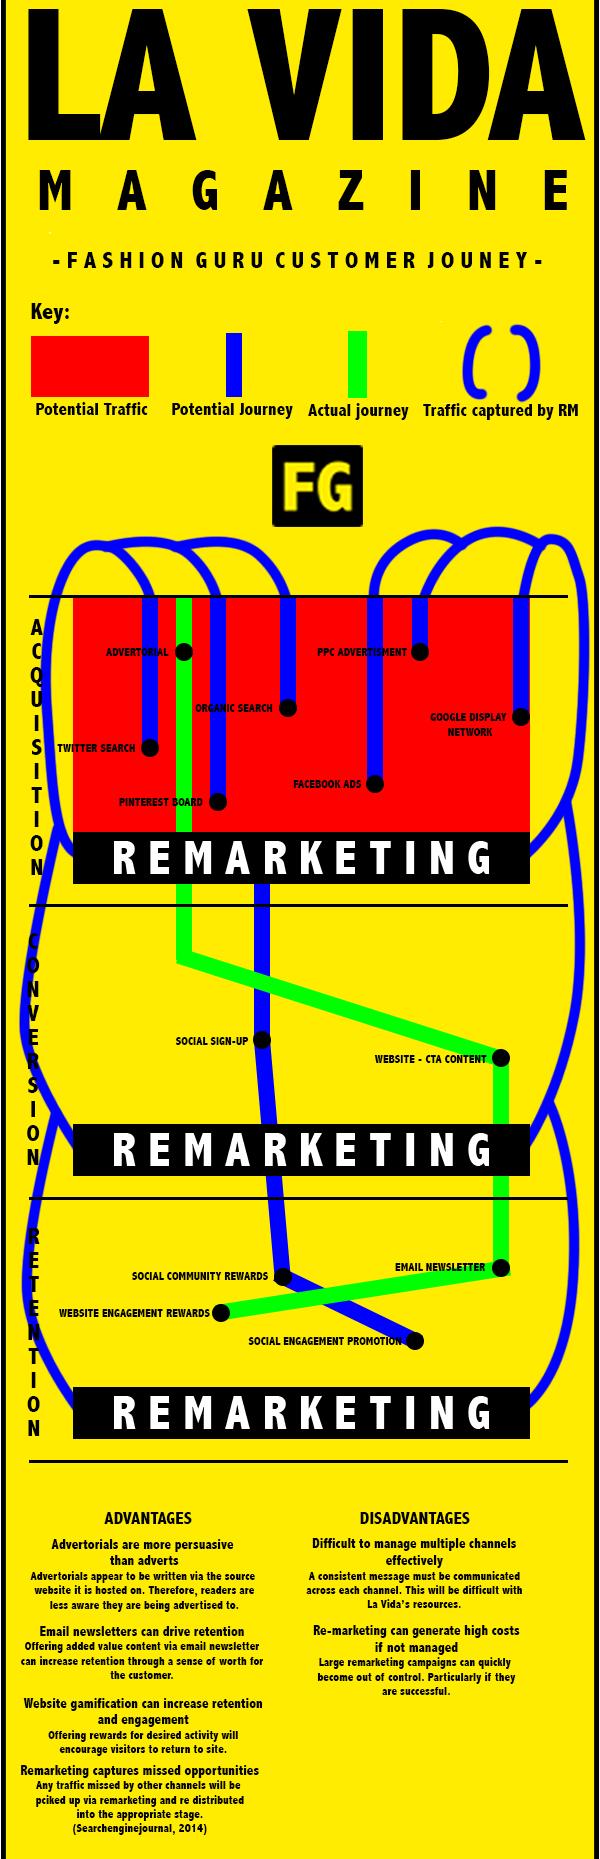 Consumer Journey